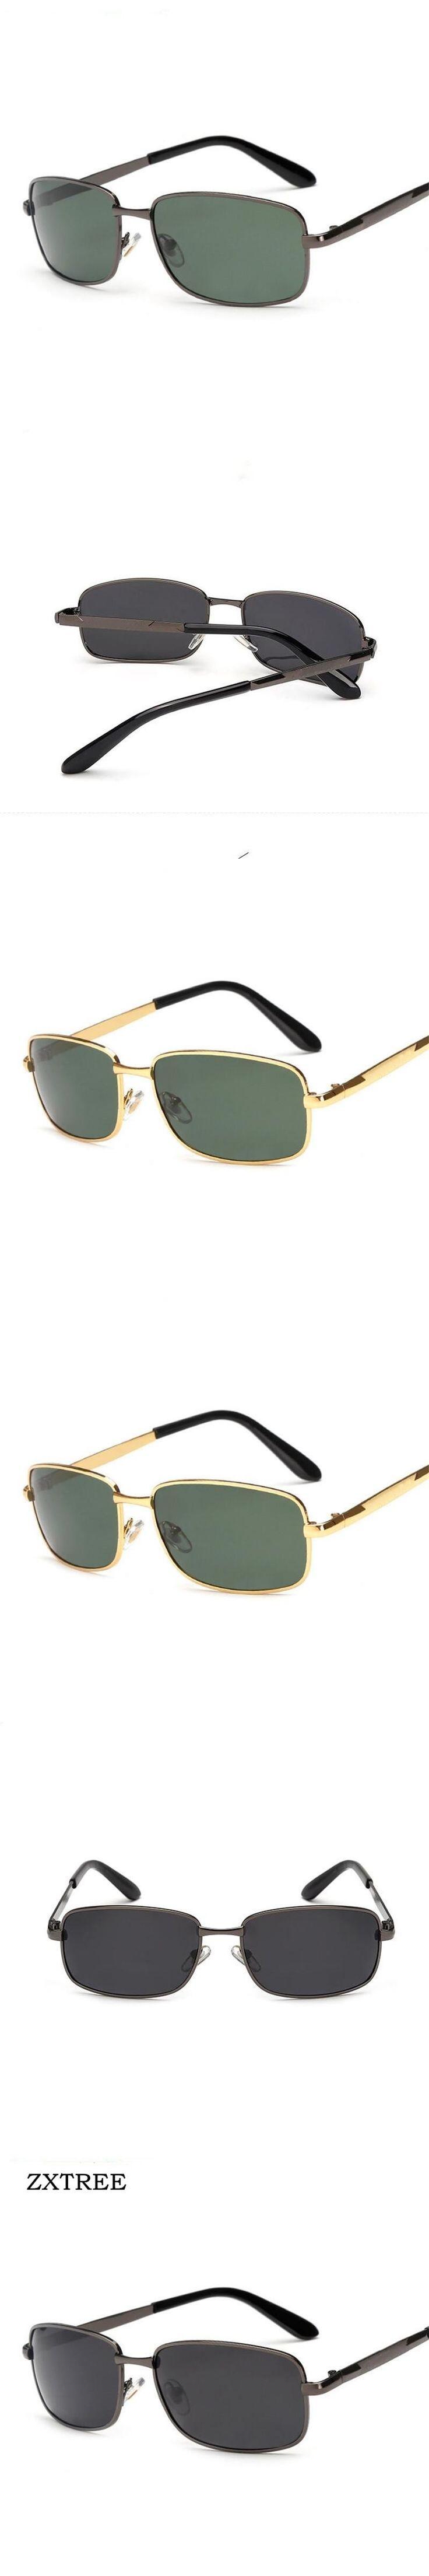 best 25+ mens glasses trends ideas on pinterest   eyewear trends